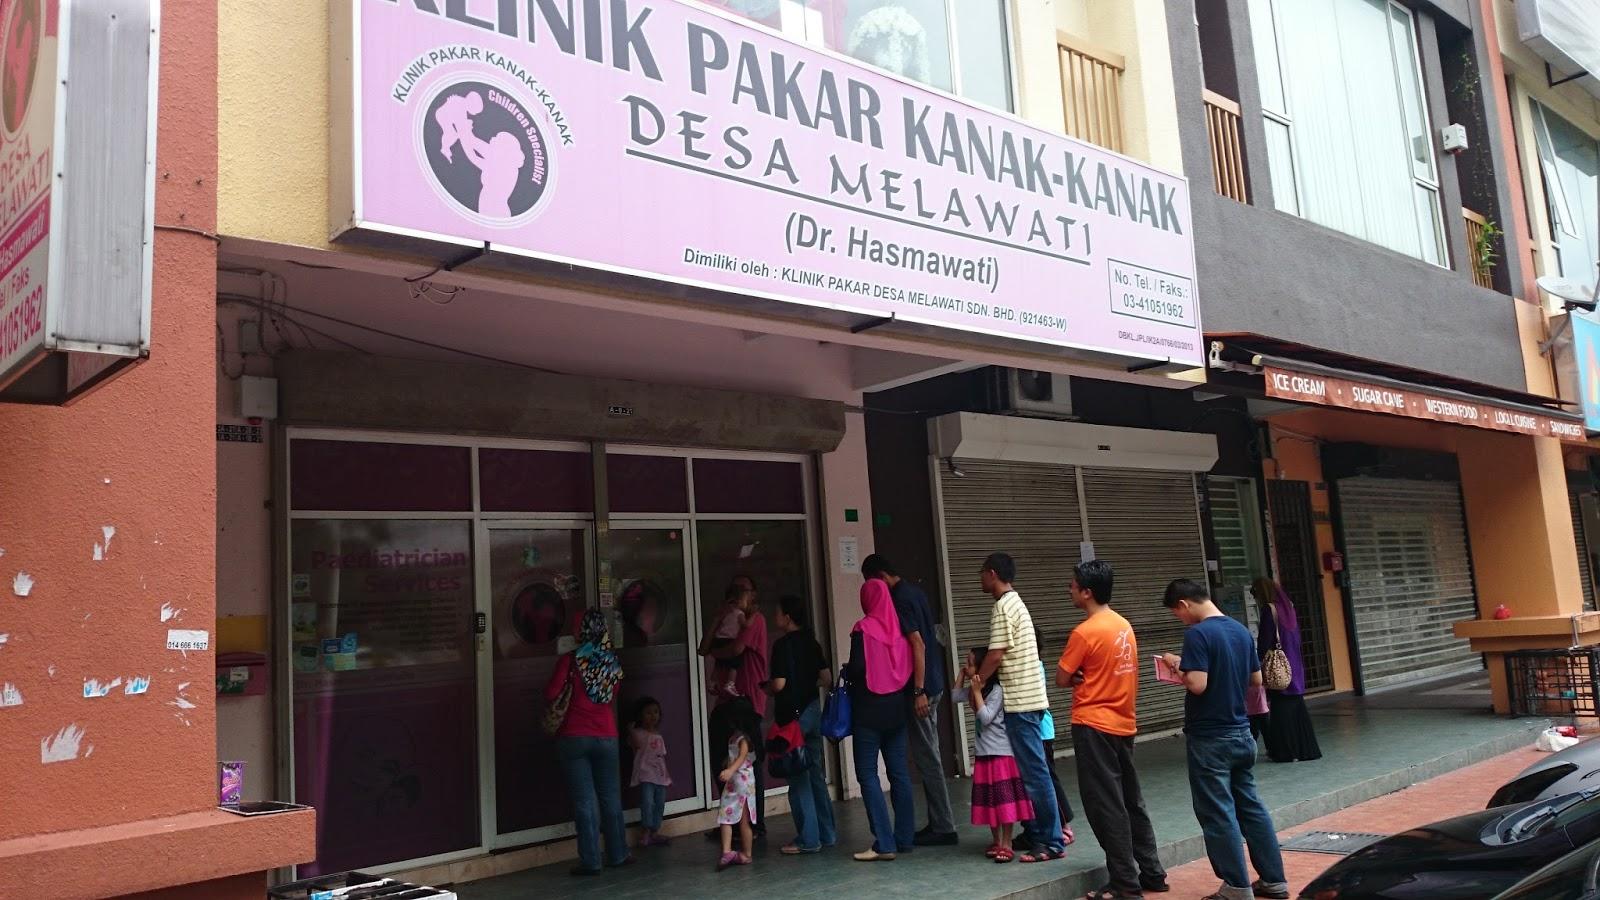 Eddy Irwan Sesuap Nasik Favourite Paed Klinik Pakar Wanita Kanak Kanak Desa Melawati